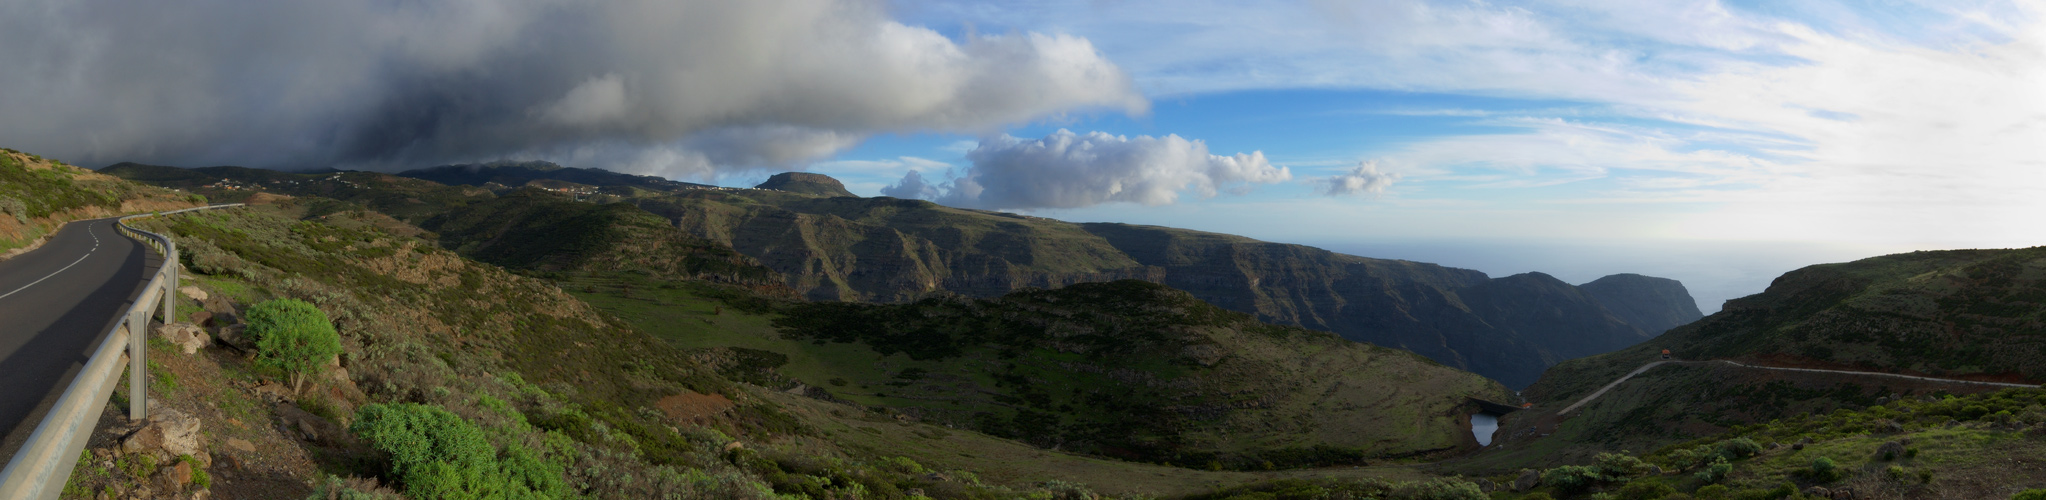 über dem Valle Gran Rey, La Gomera